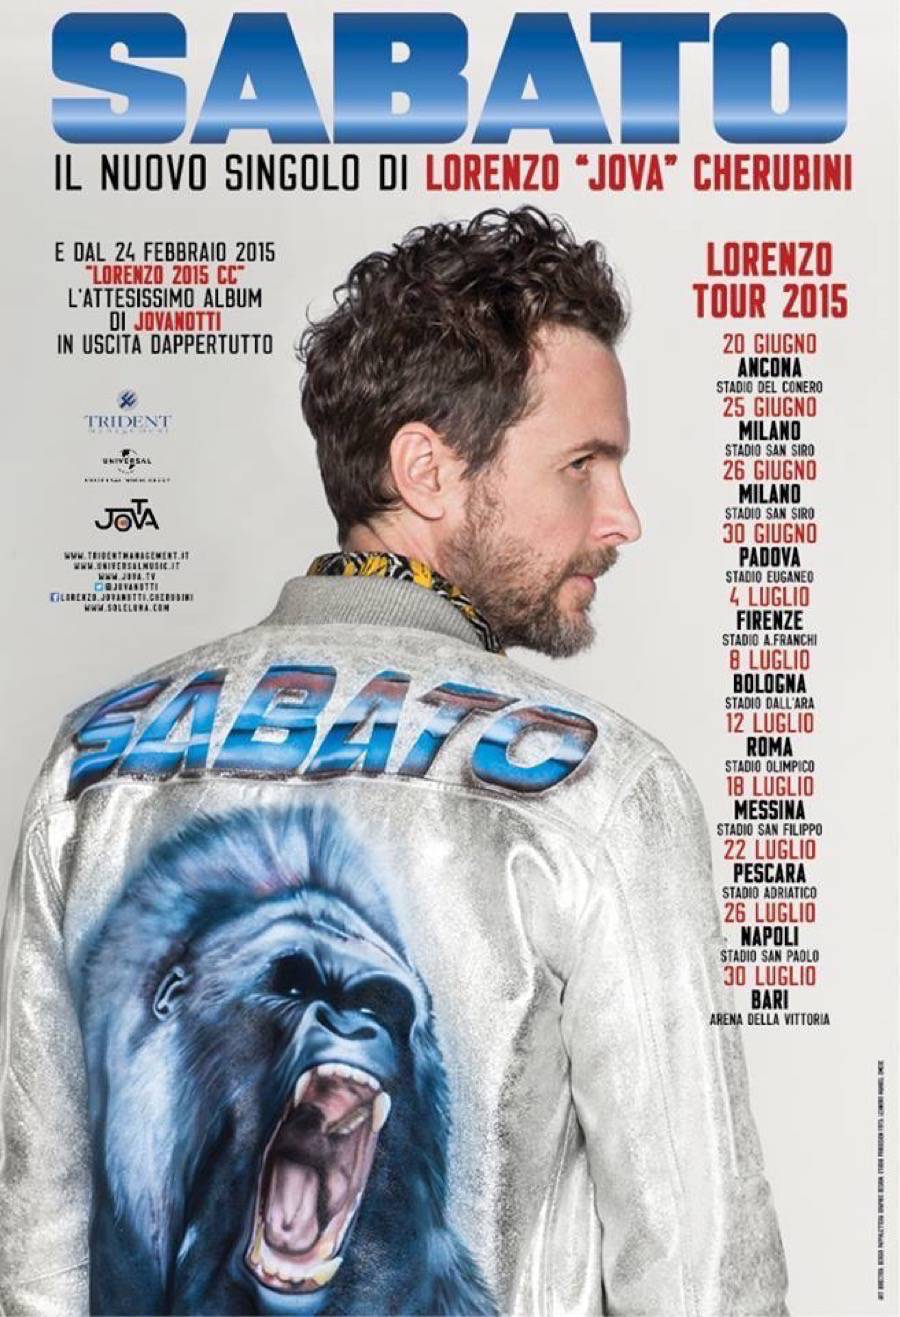 lorenzo-jovanotti-2015cc-sabato